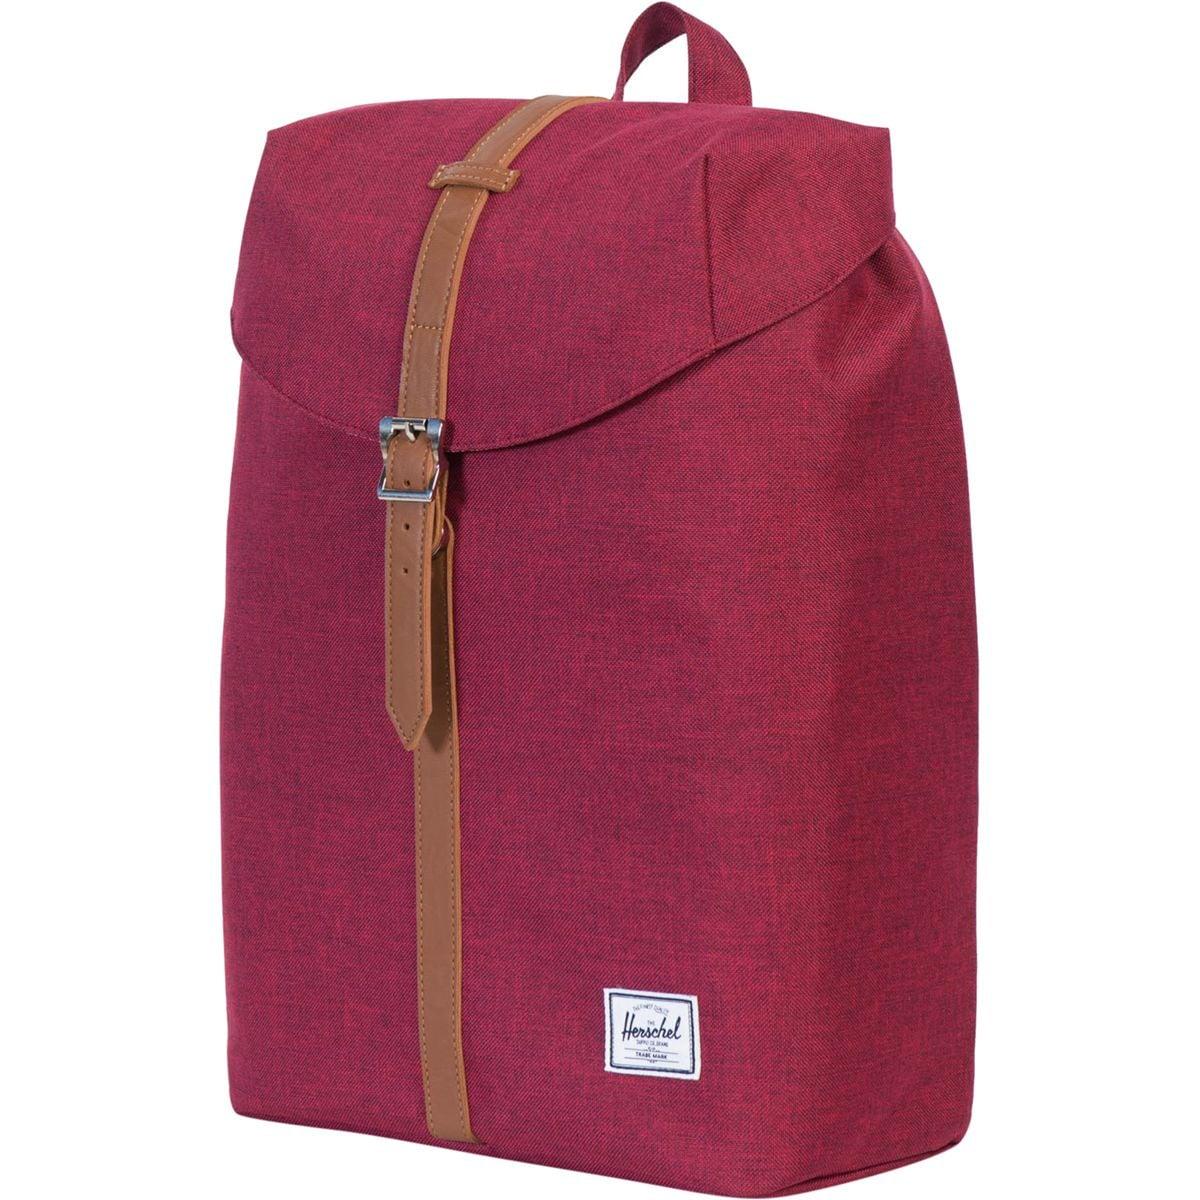 Herschel Supply Post Mid-Volume 16L Backpack HRS004M